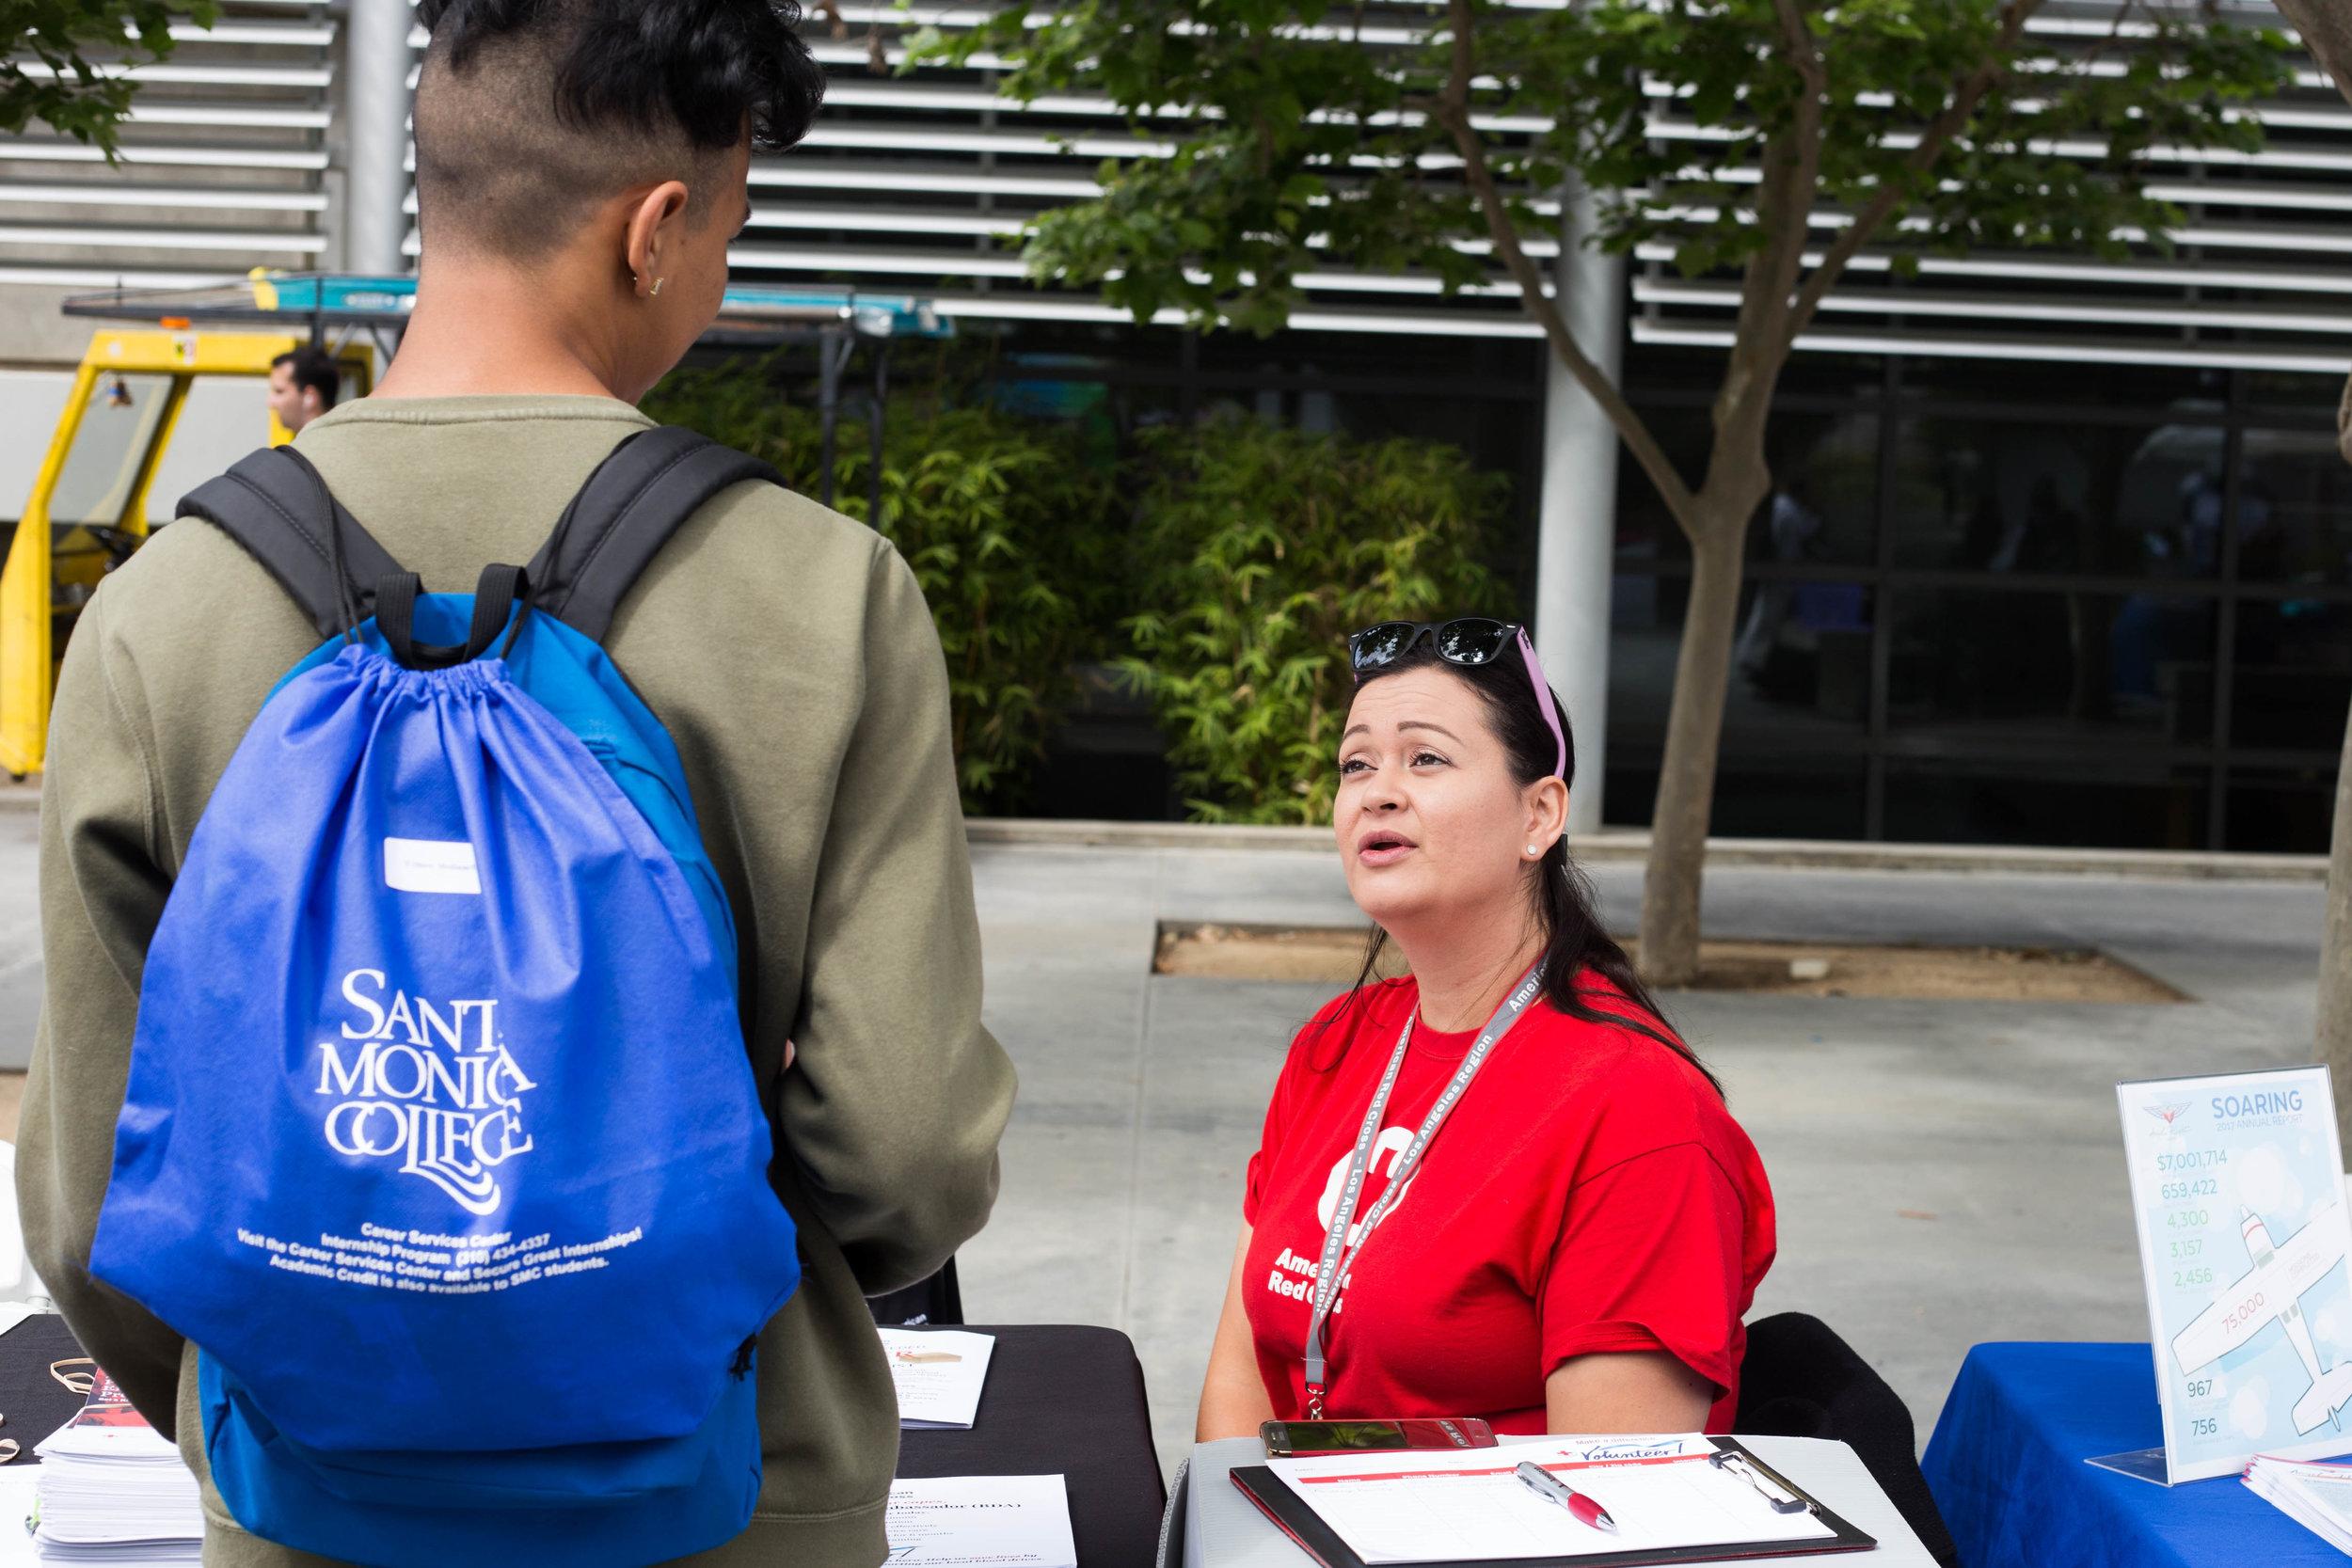 Santa Monica College (SMC) Internship Fair: American Red Cross Table., Ana Ramirez, Volunteer Recruitment Representative talking to a SMC student.  SMC main campus. Santa Monica, California. Tuesday May 22. (Fernanda Rivera/ Corsair Photo)